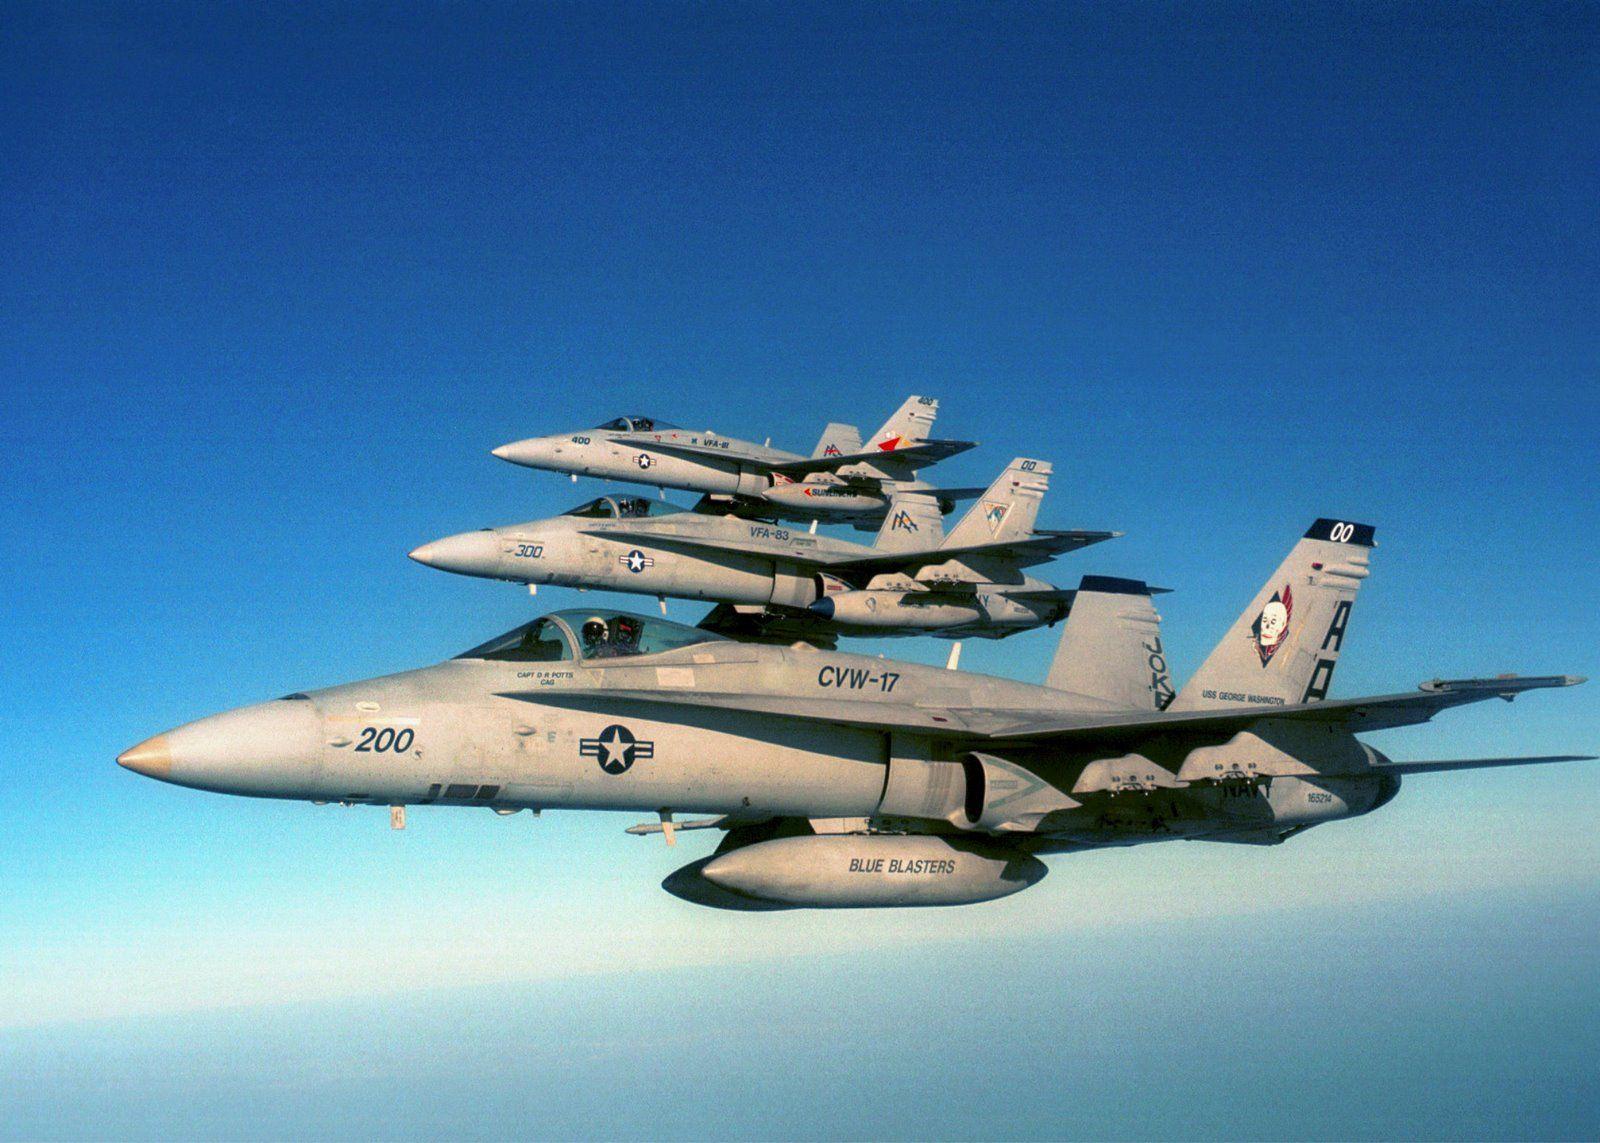 F A 18 Super Hornet Wallpapers Fhdq Cover